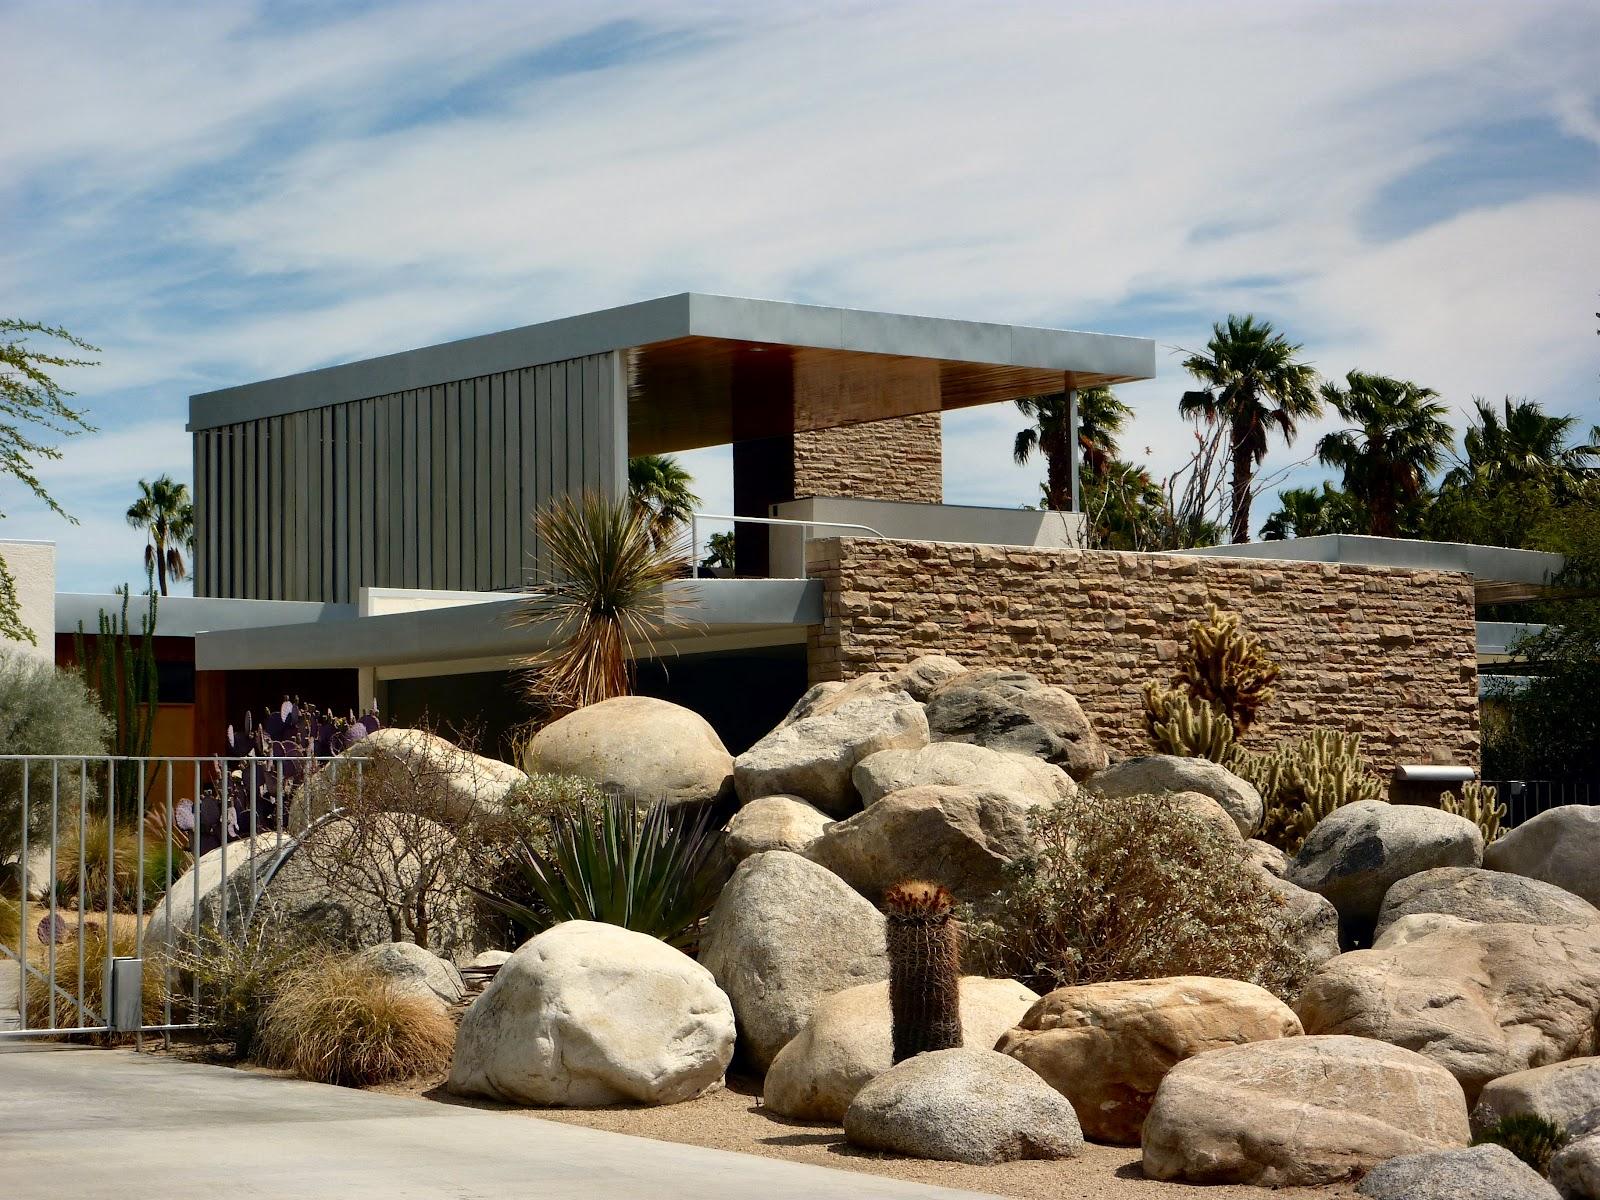 Kaufmann+Desert+House Palm Desert Home Designs on santa barbara home designs, katy home designs, cypress home designs, lakeside home designs, mountain view home designs, seaside home designs, lake tahoe home designs,